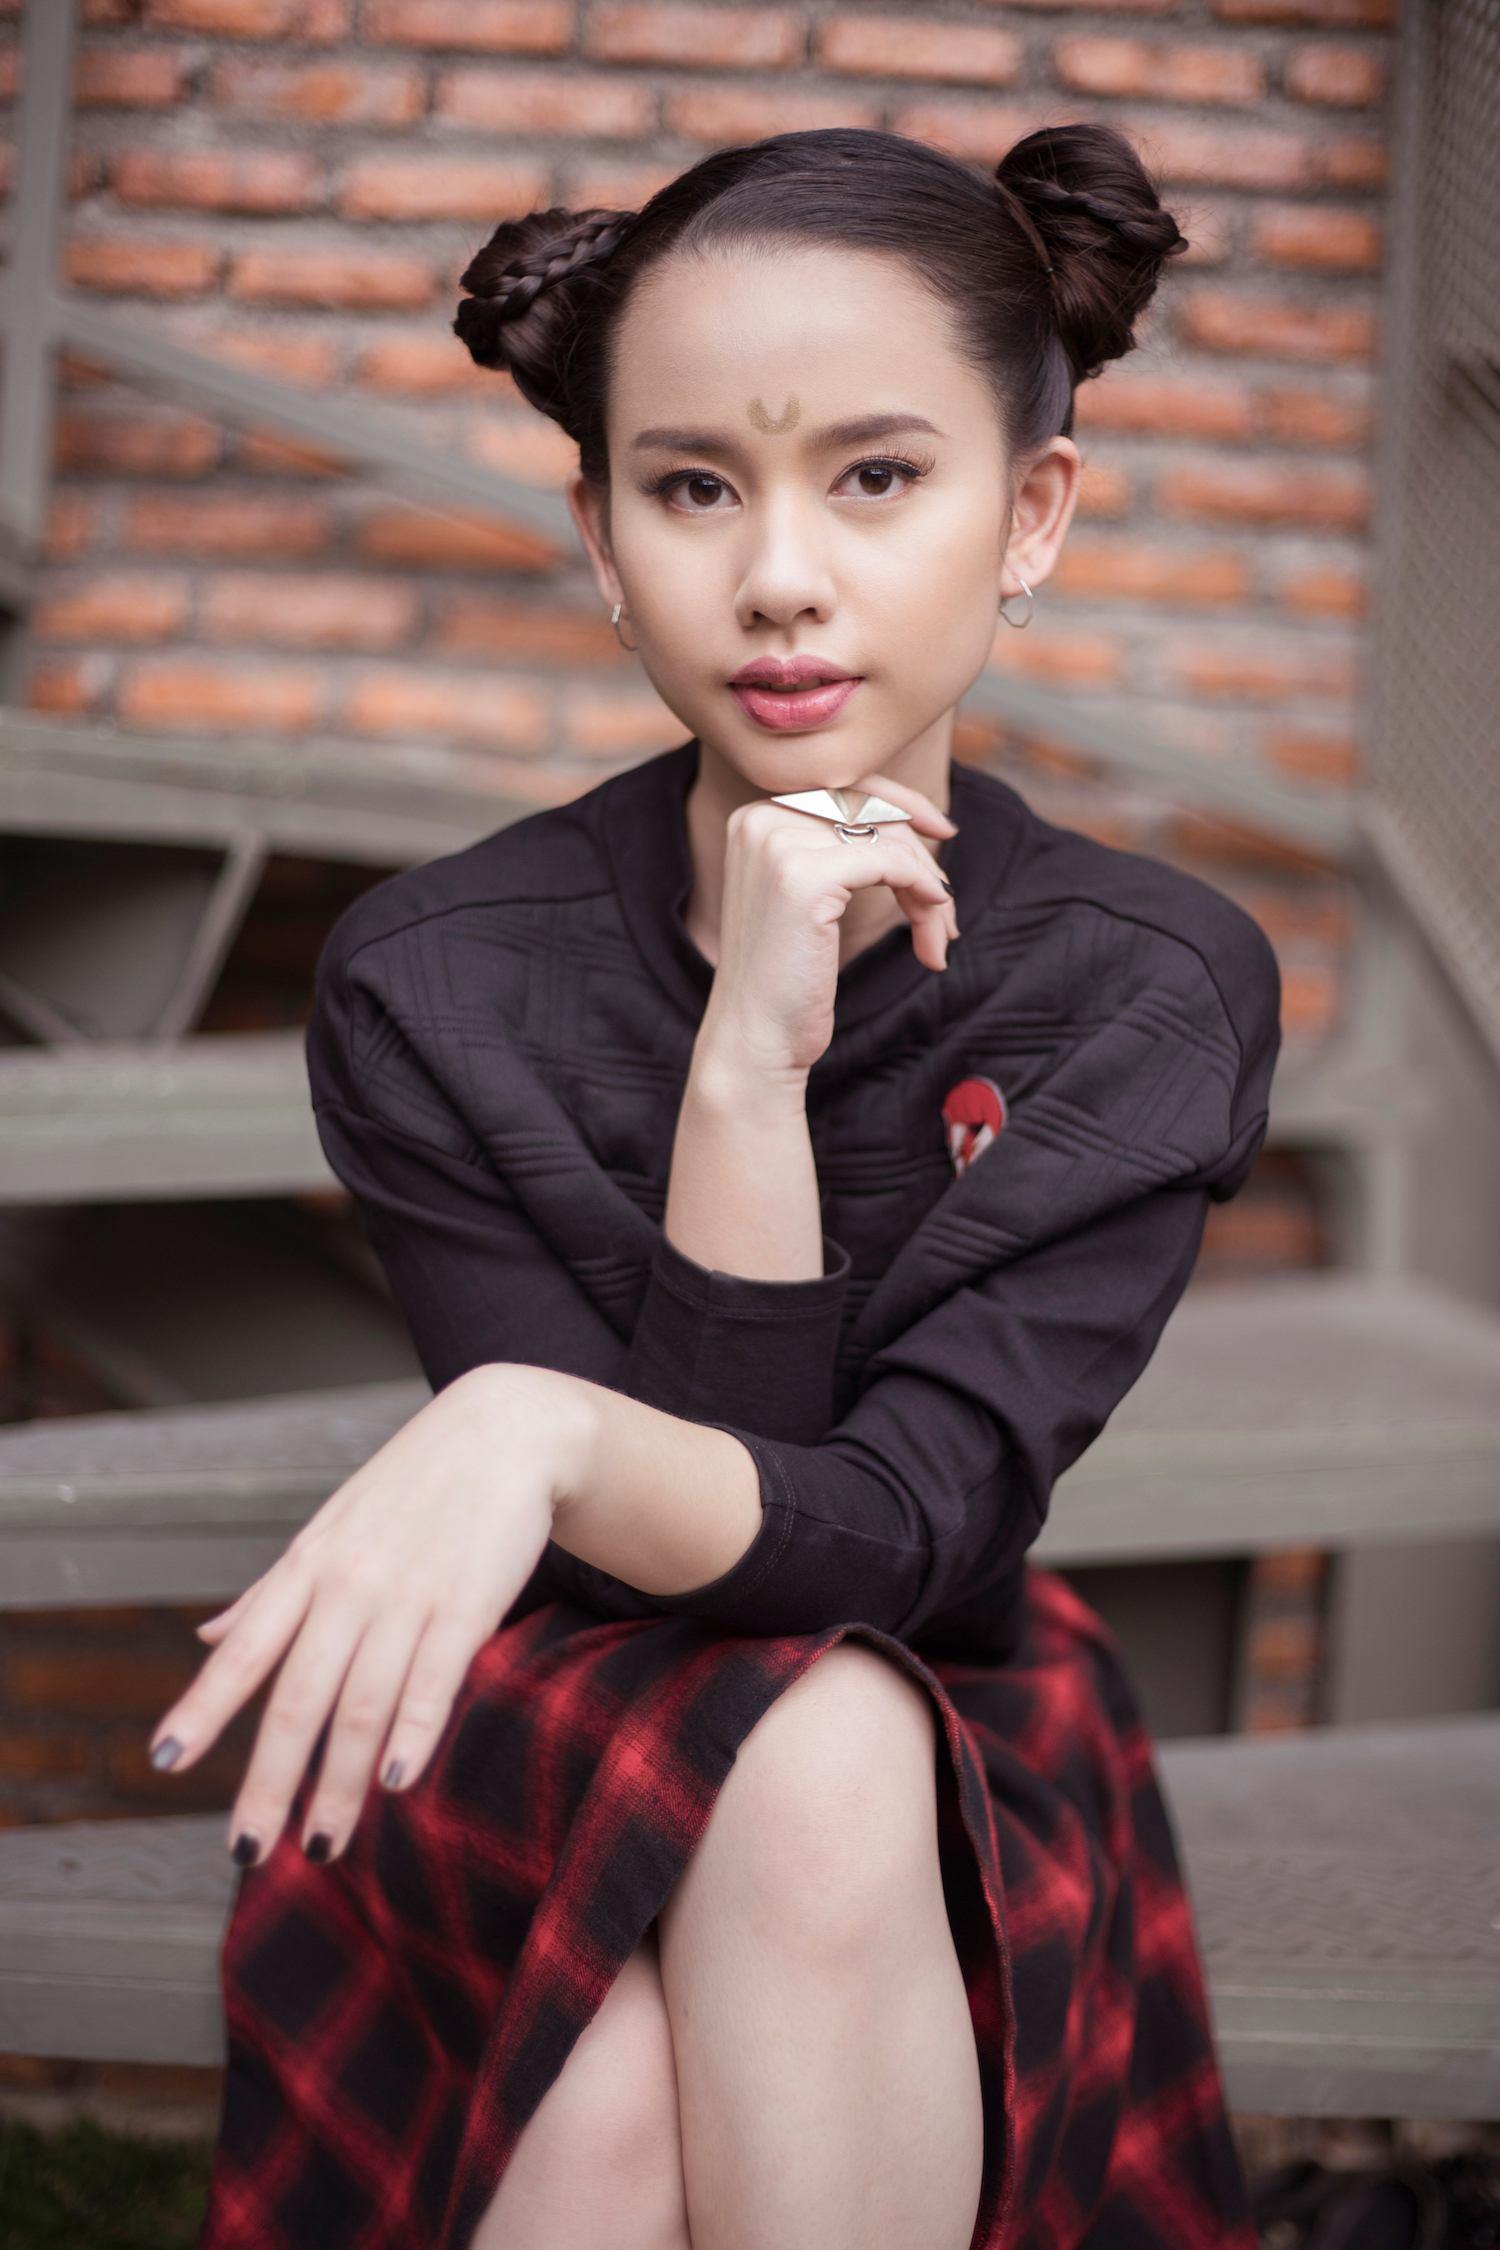 Wanita Asia dengan model rambut anime gaya space buns